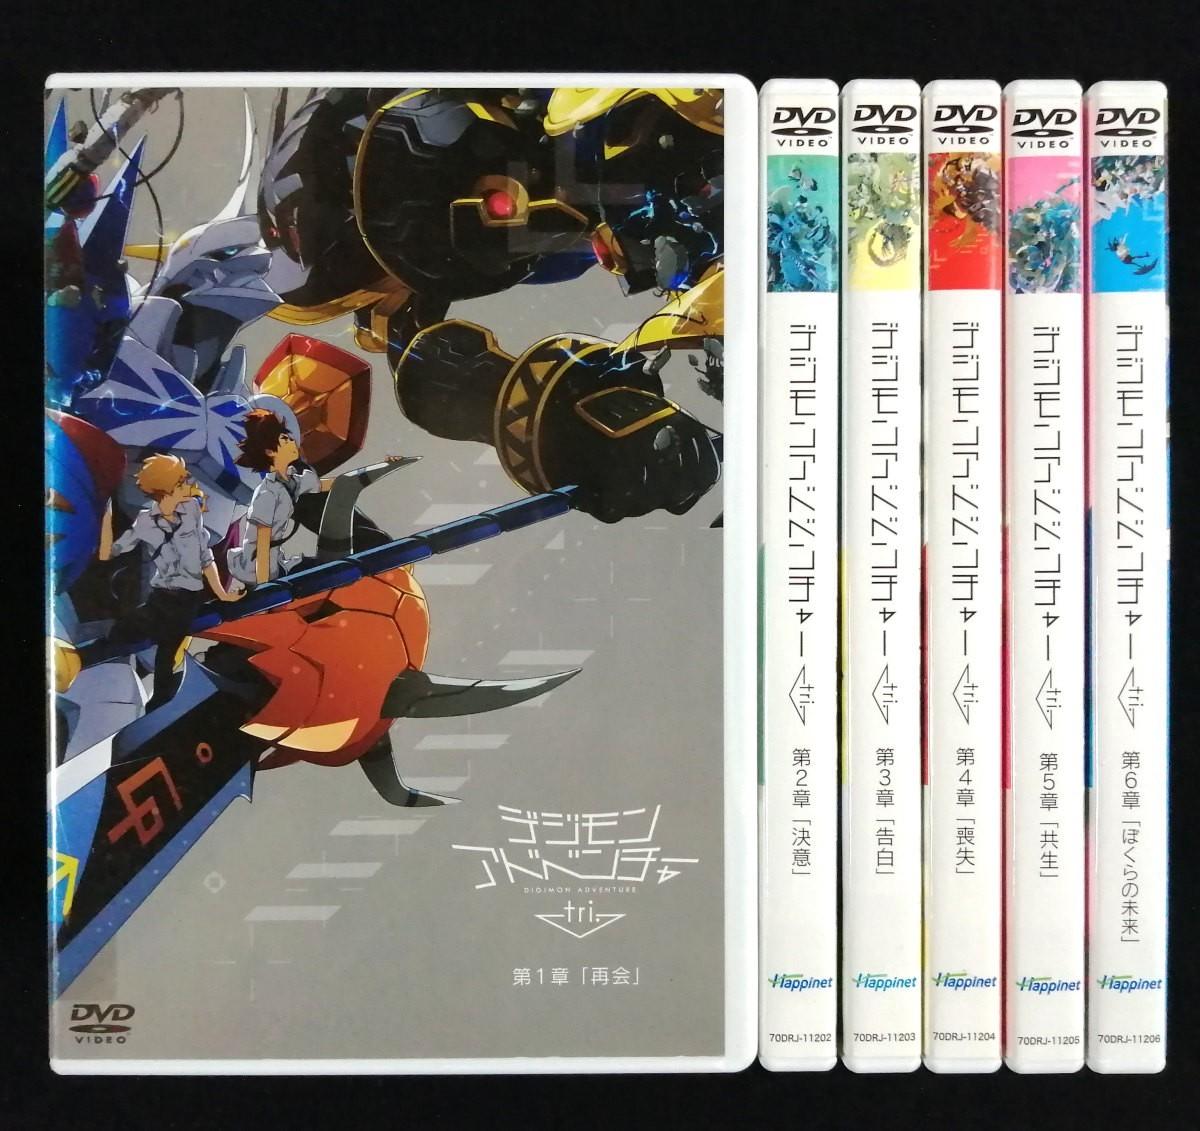 DVD 「デジモンアドベンチャーtri.」 全6巻セット レンタル版